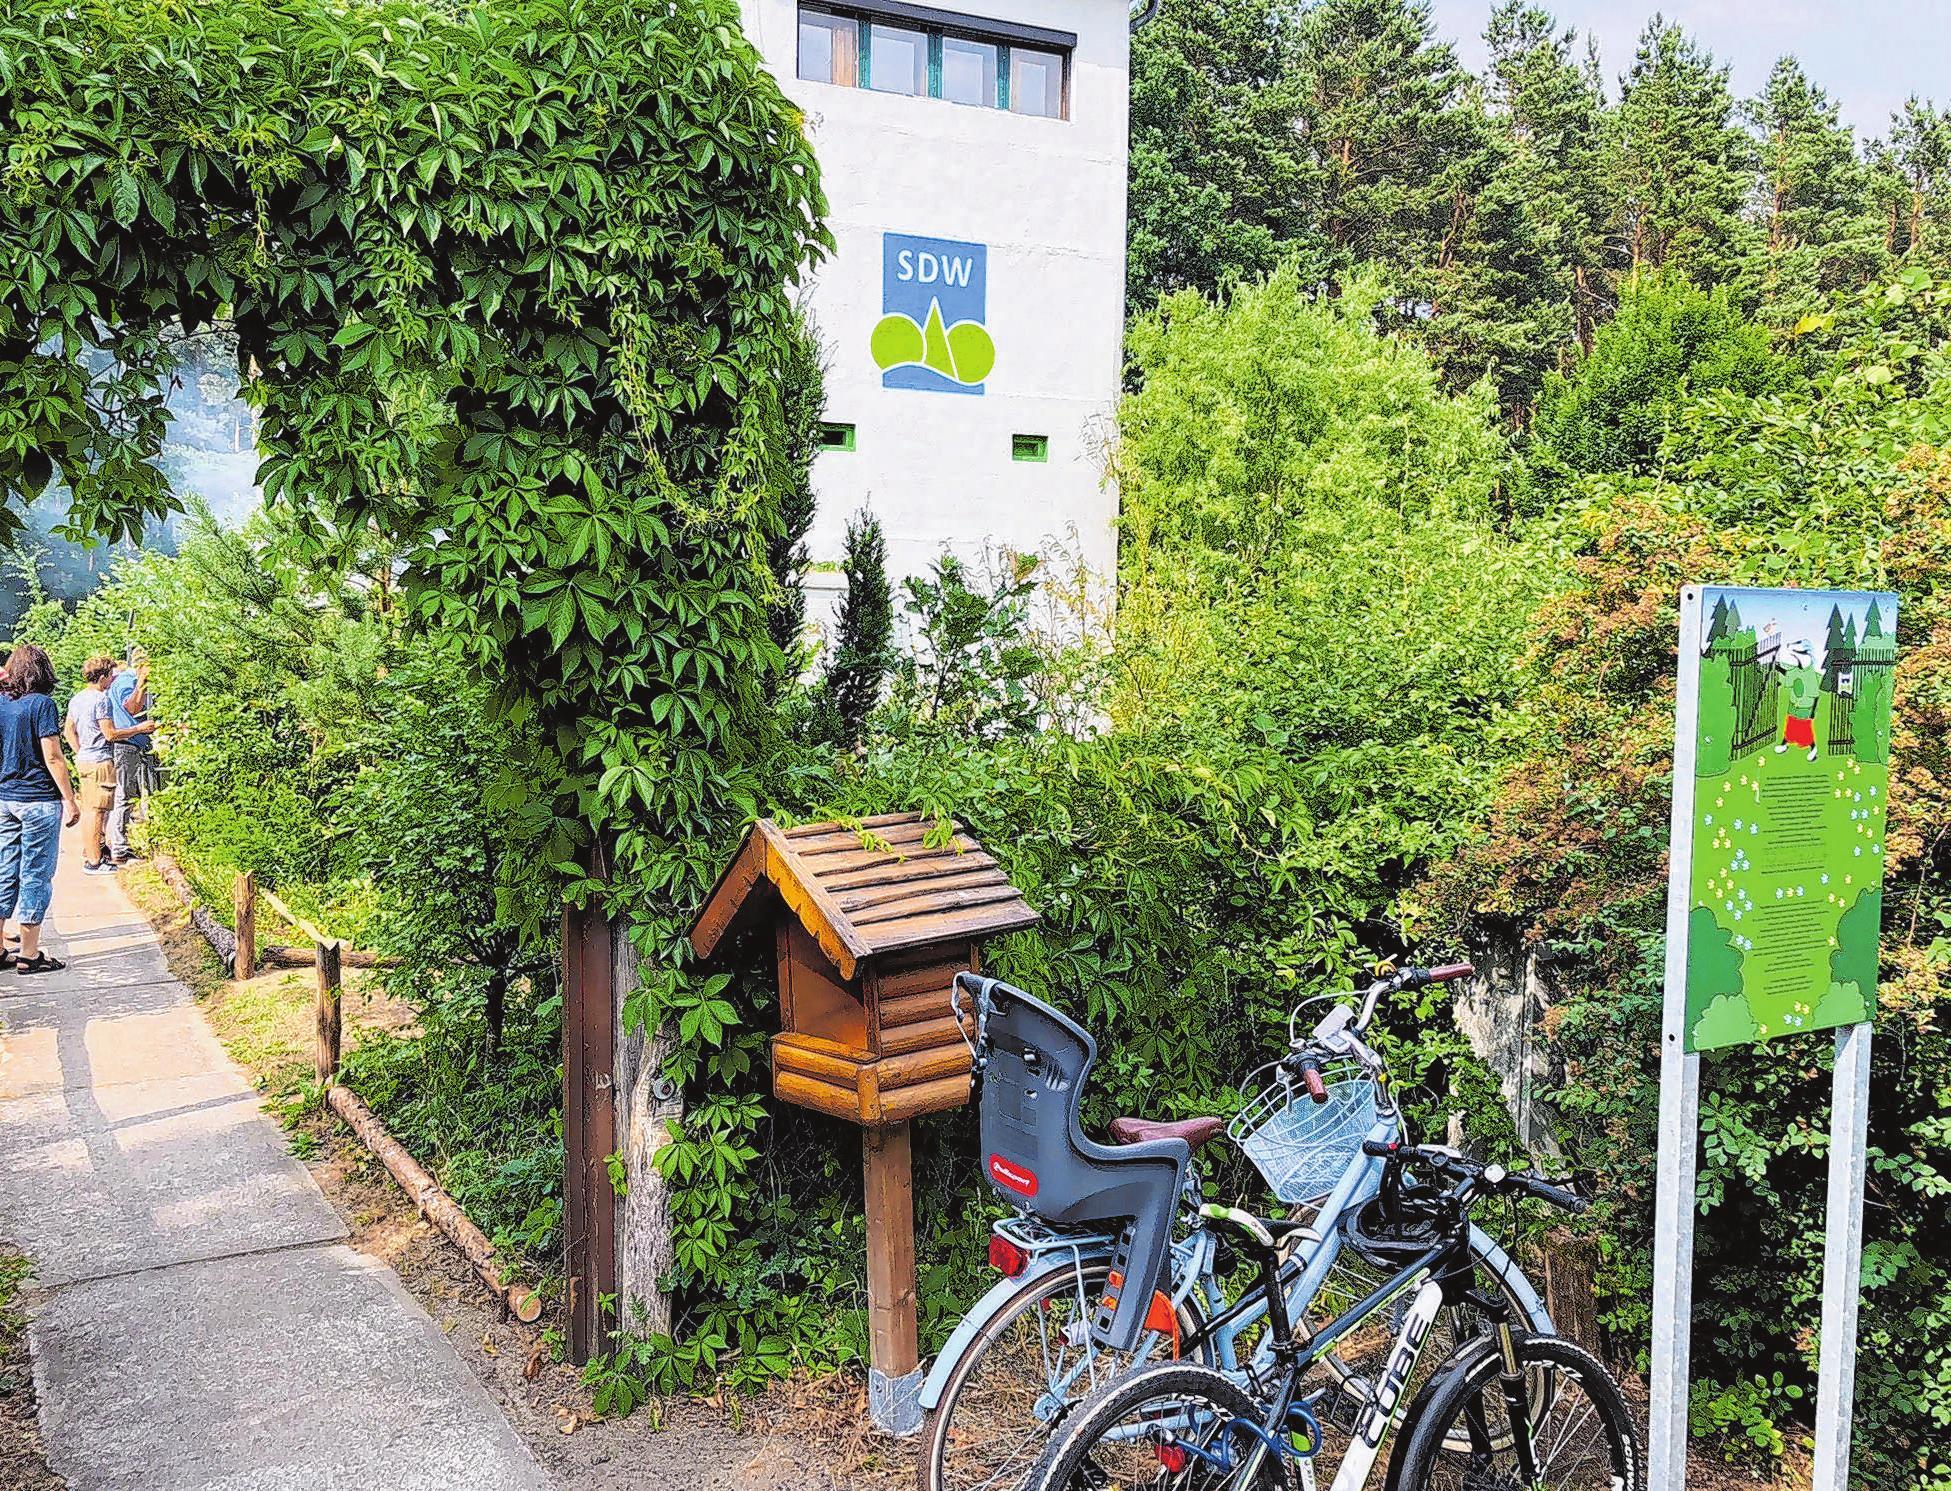 Natur trifft Geschichte: Im Naturschutzturm Bergfelde wird am 15. Juni ein Sommerfest gefeiert. Foto: Hartung